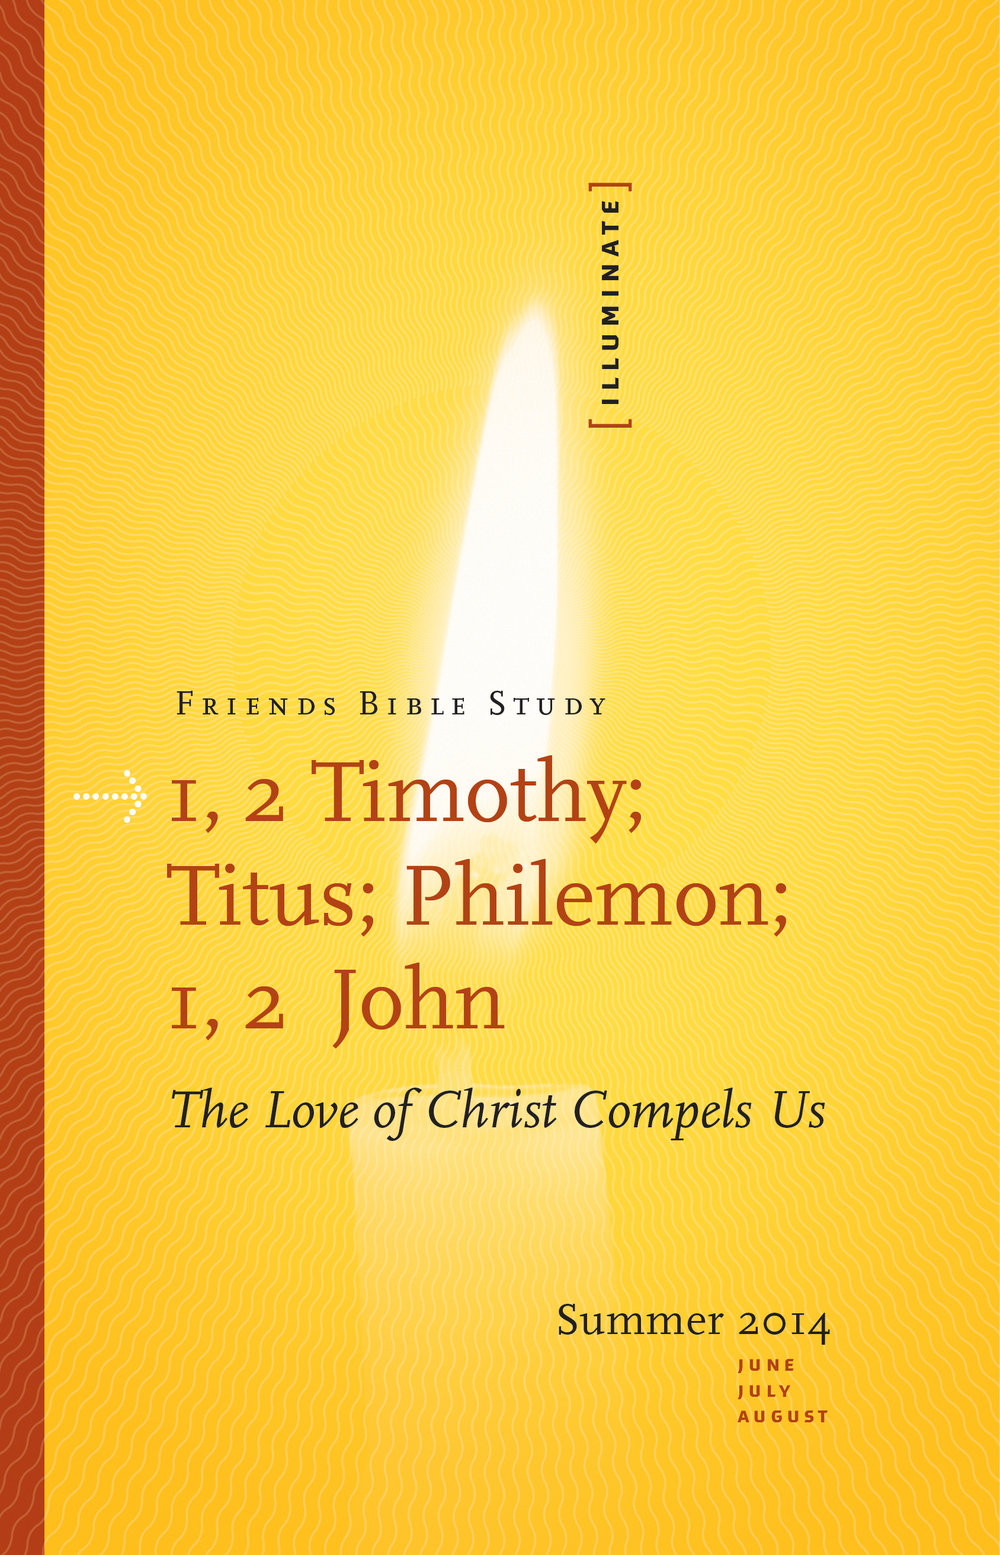 Illuminate2013-14 D-summer-Tim,Titus,Phil,123John.jpg